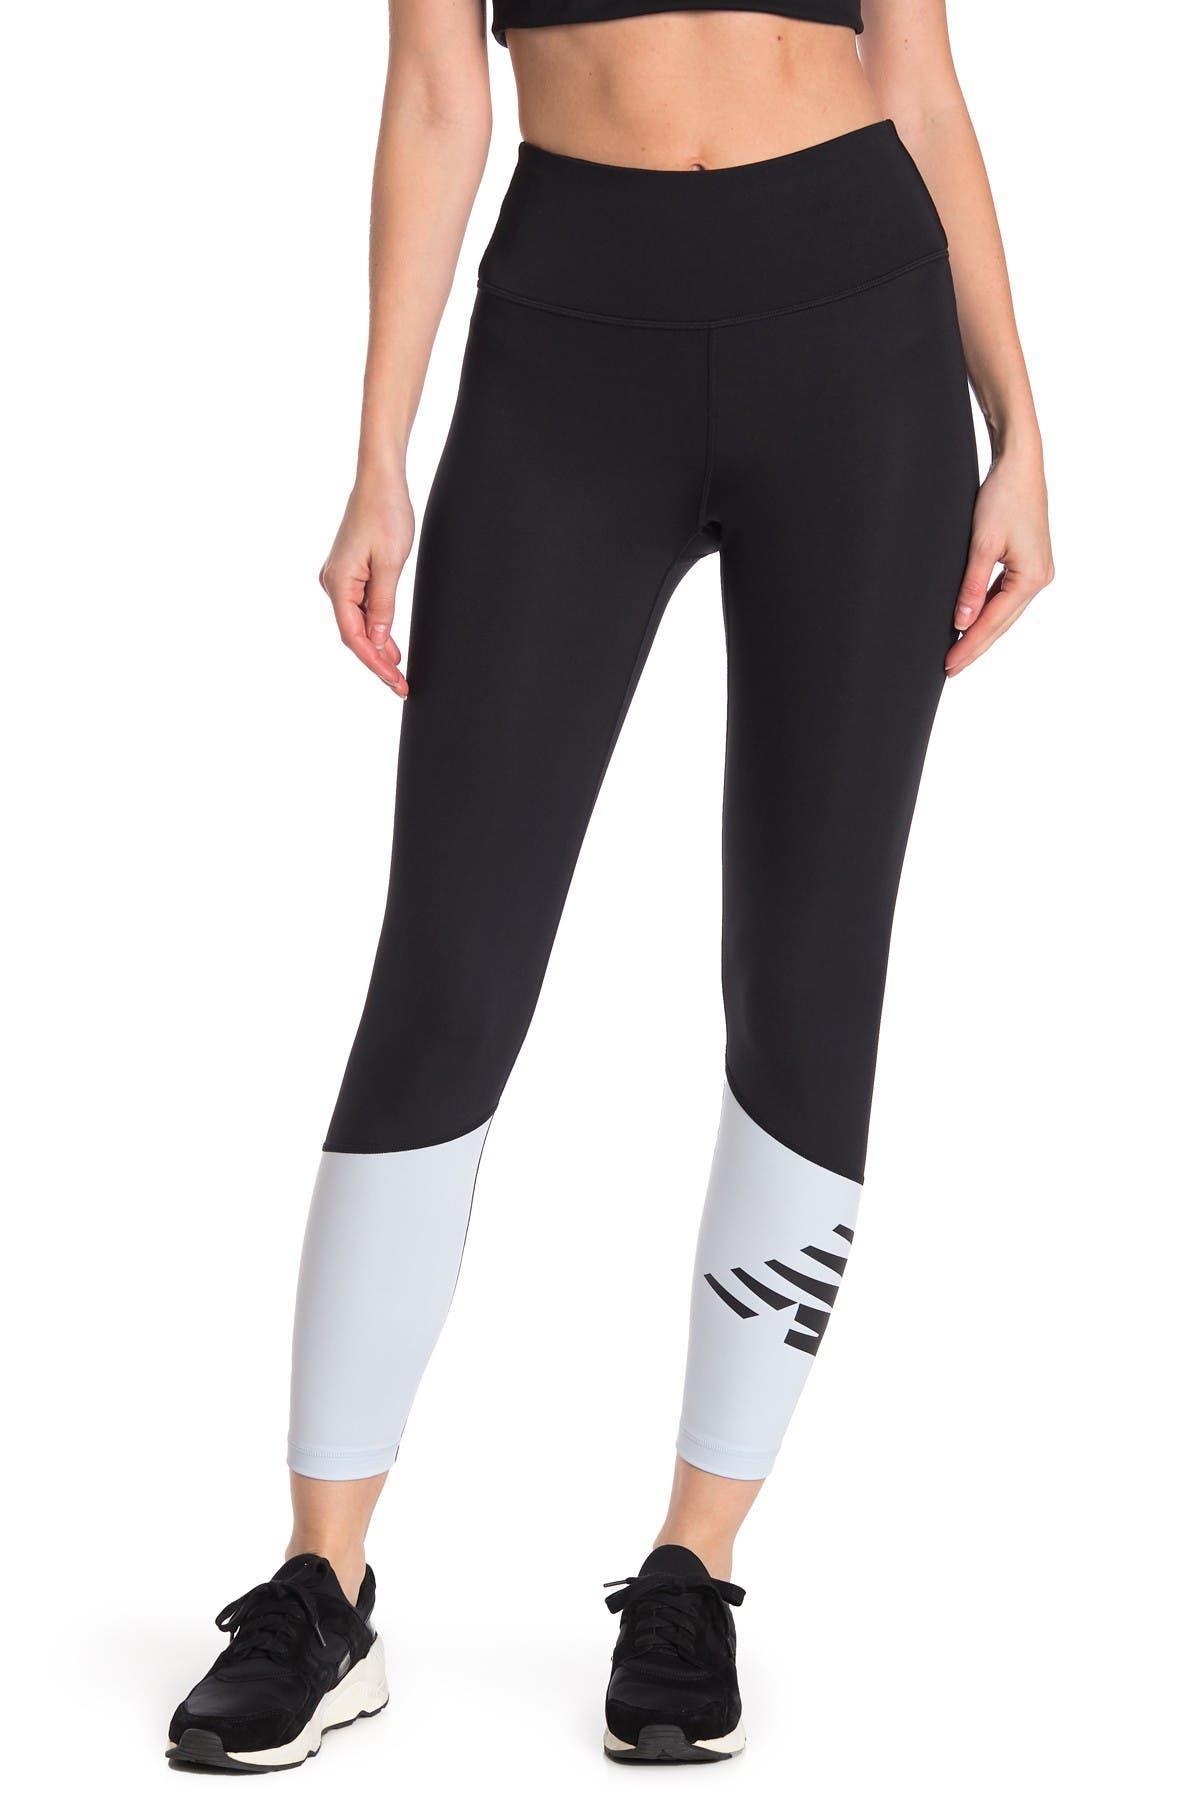 Image of New Balance Colorblock Leggings